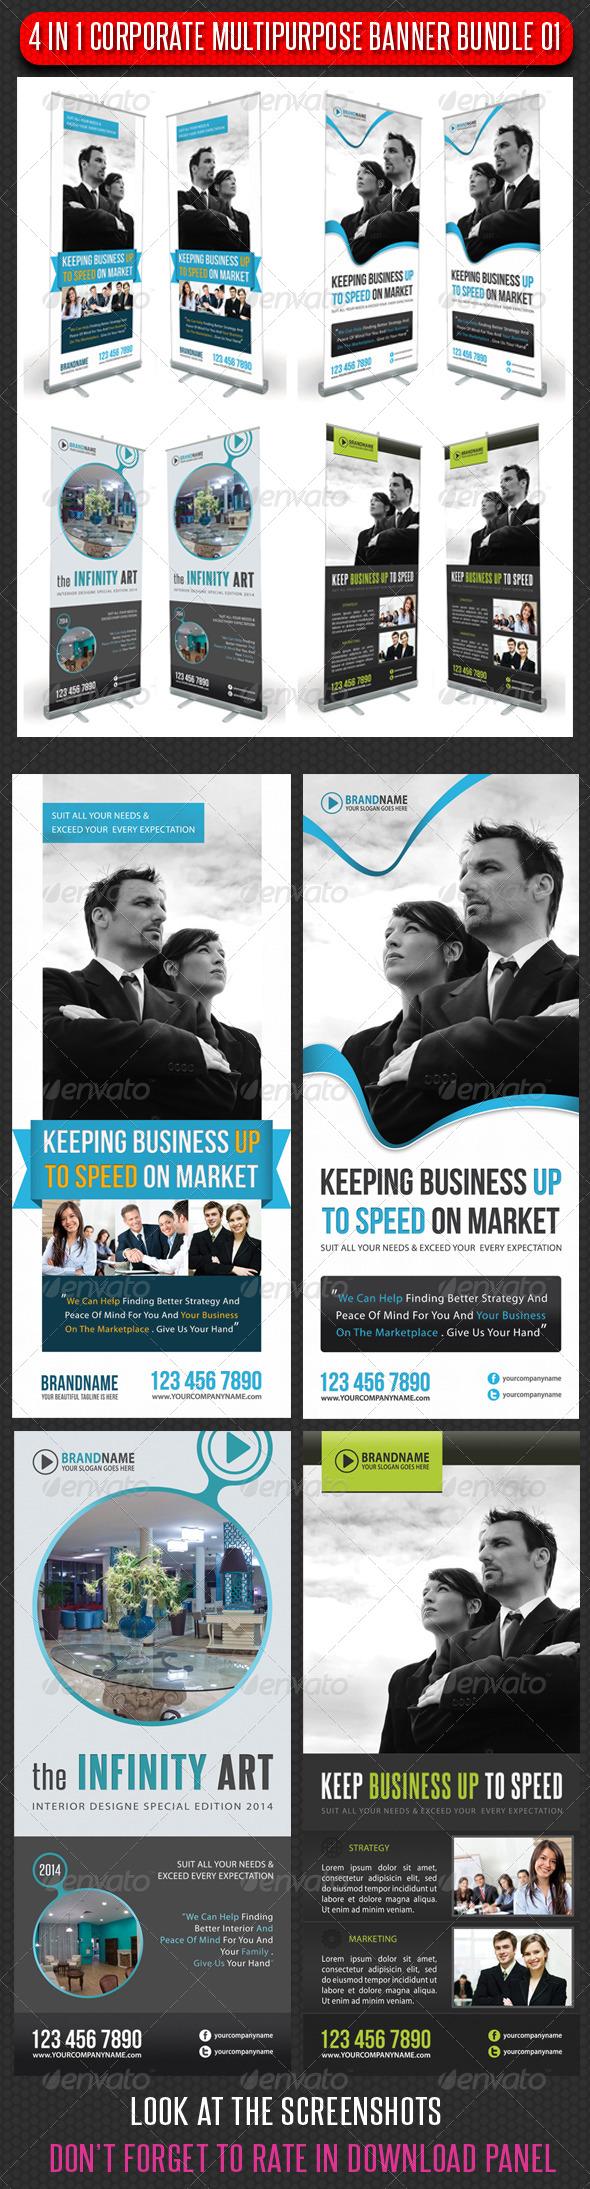 4 in 1 Corporate Multipurpose Banner Bundle 02 - Signage Print Templates